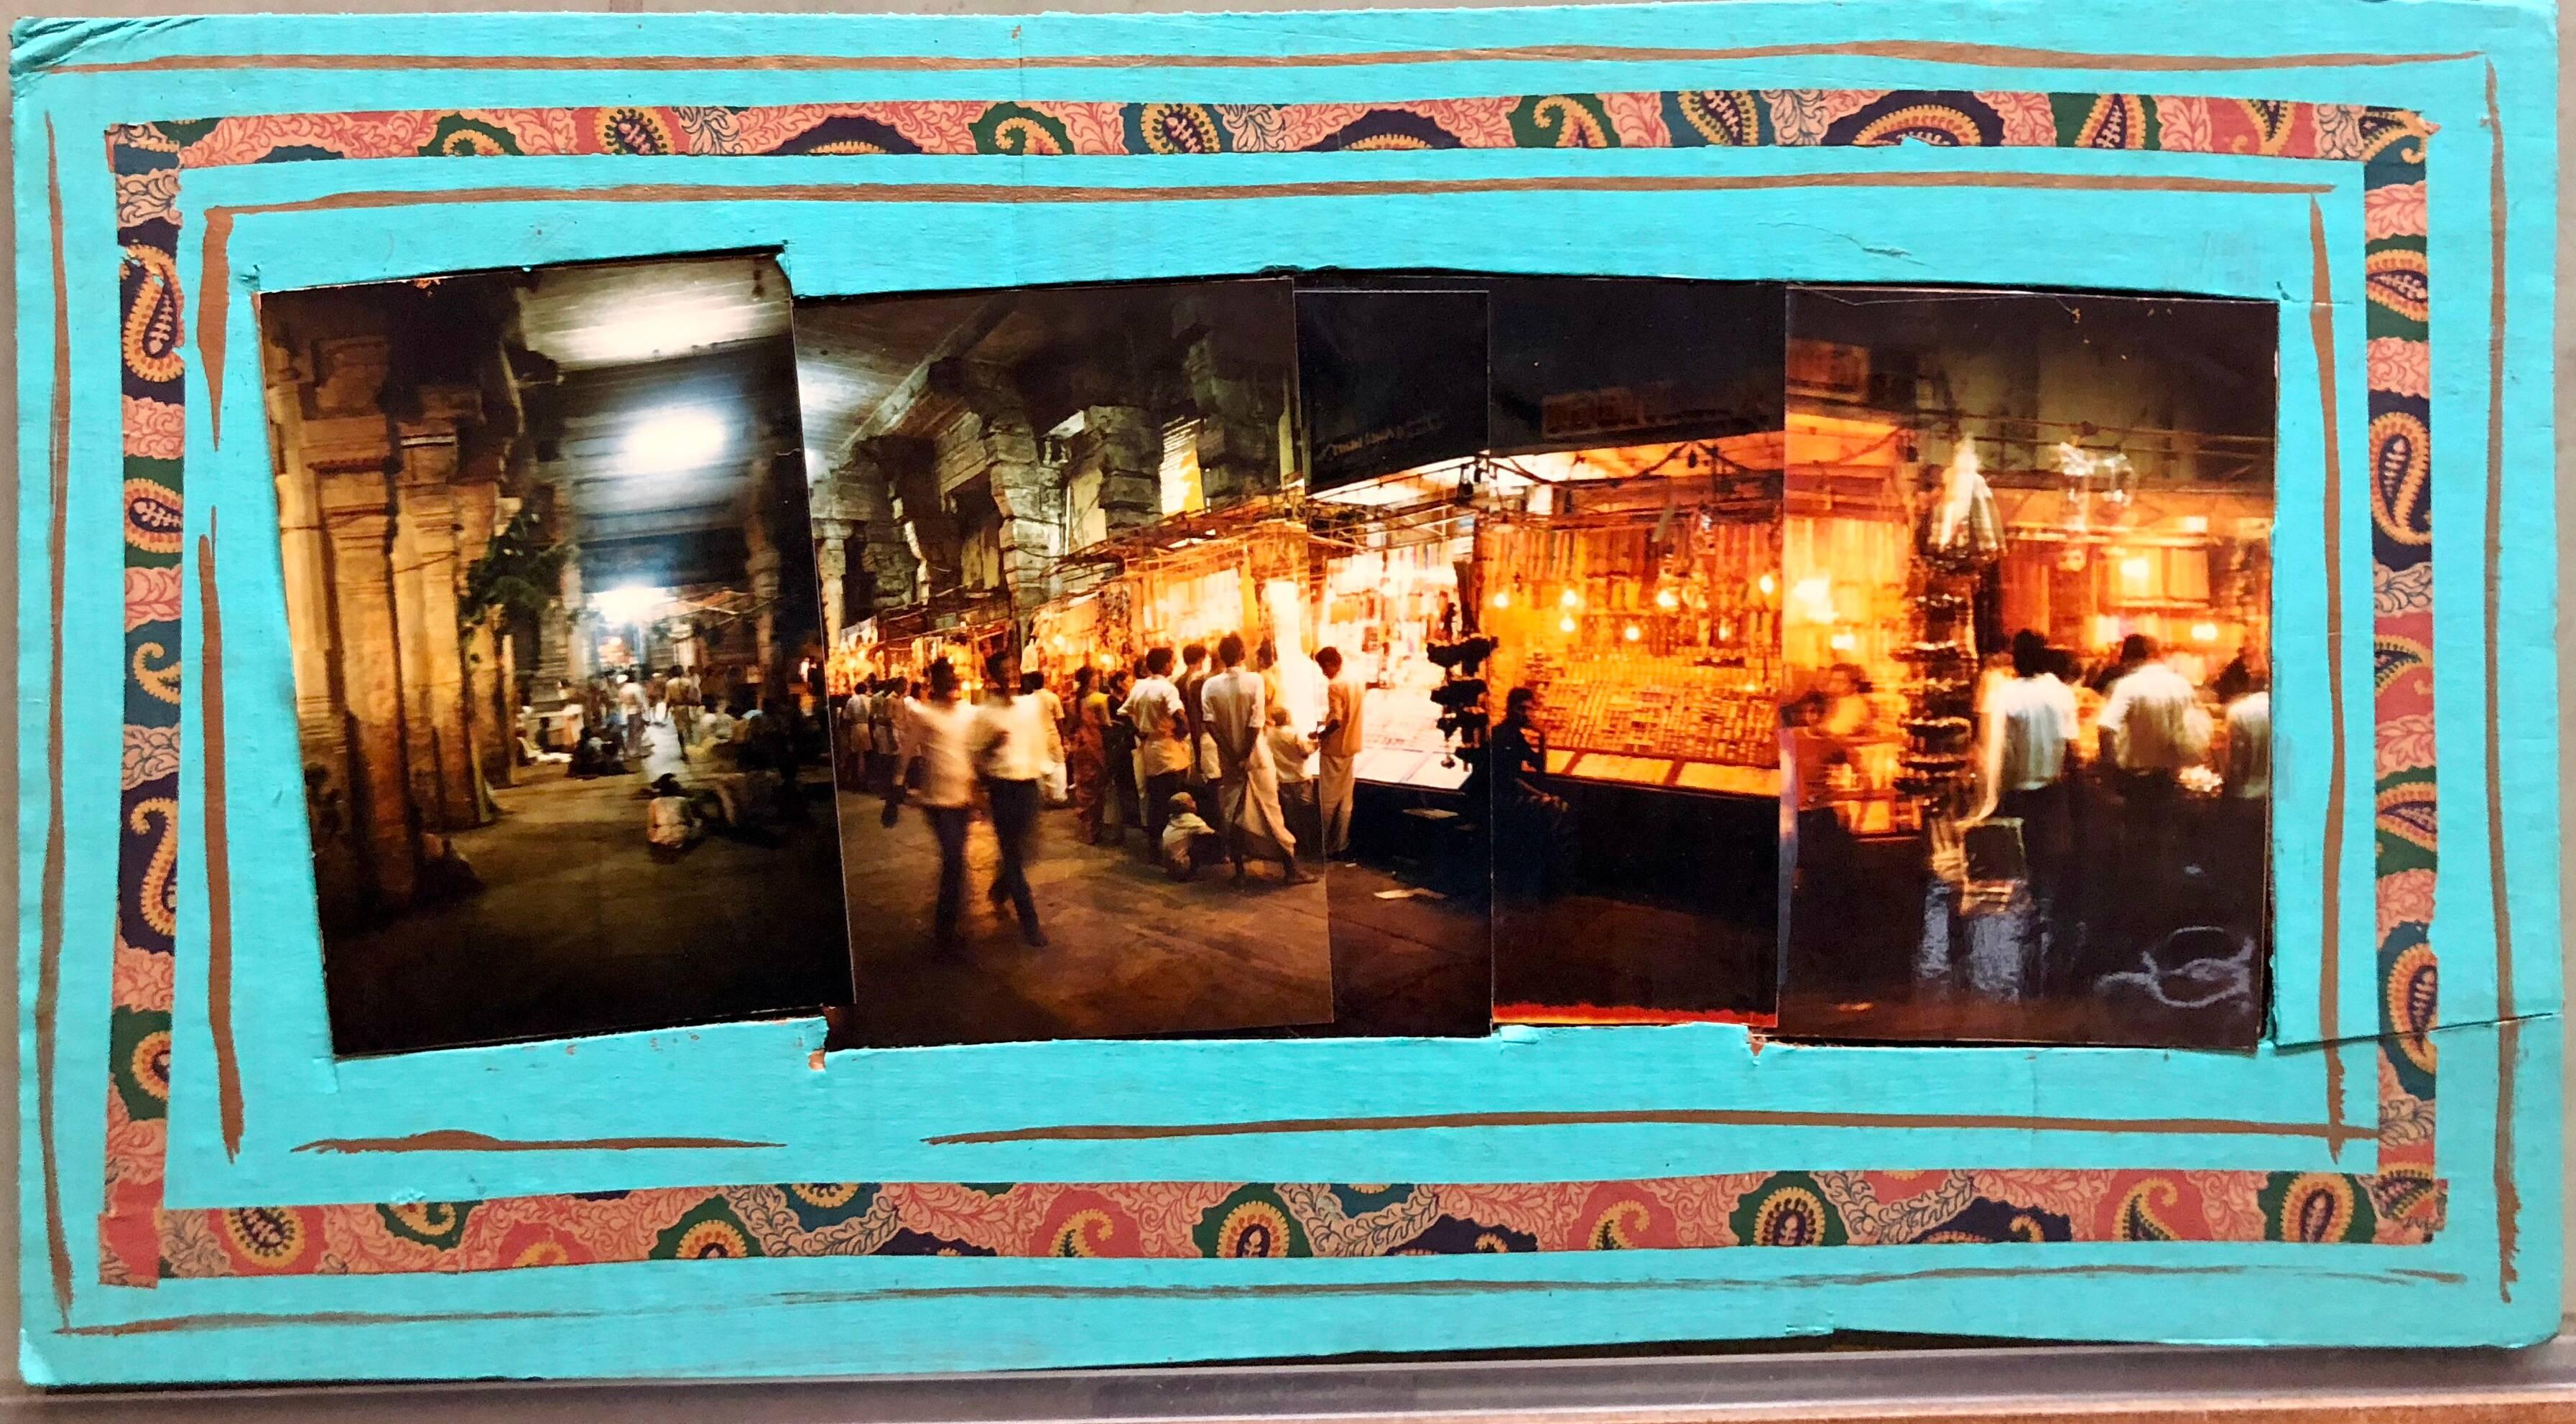 Sri Ranganathanswamy Temple, Trichi, 1992, Photo Prints on Cardboard, Collage